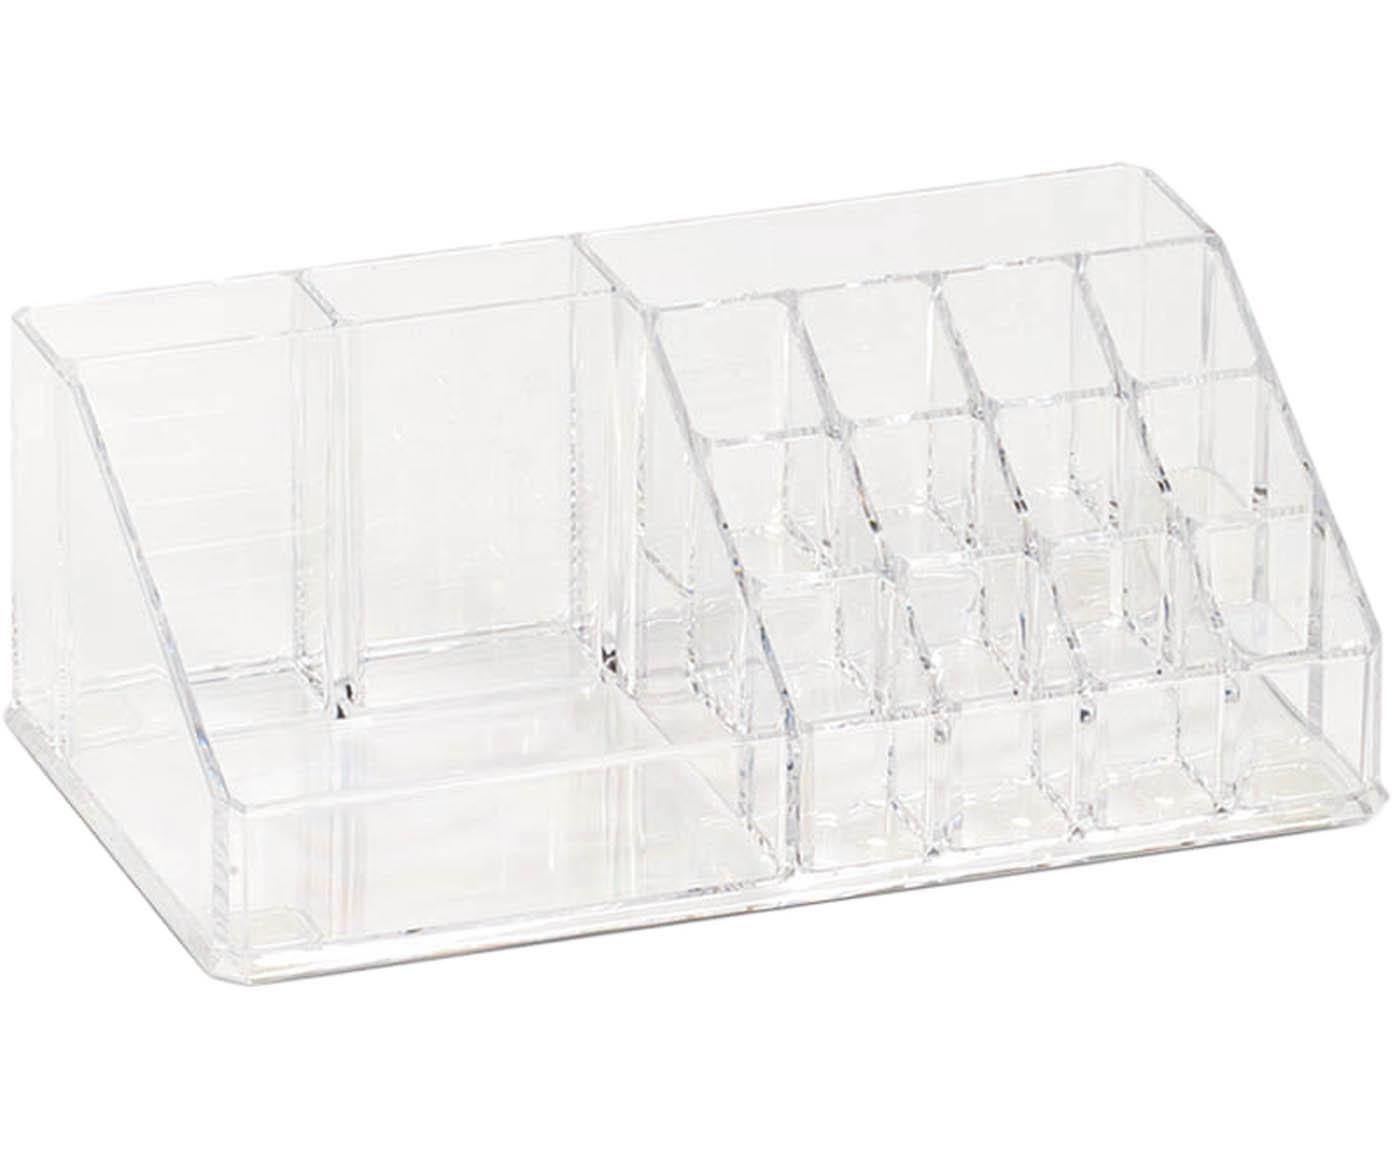 Organizador de cosméticos Clear, Plástico, Transparente, An 22 x Al 8 cm